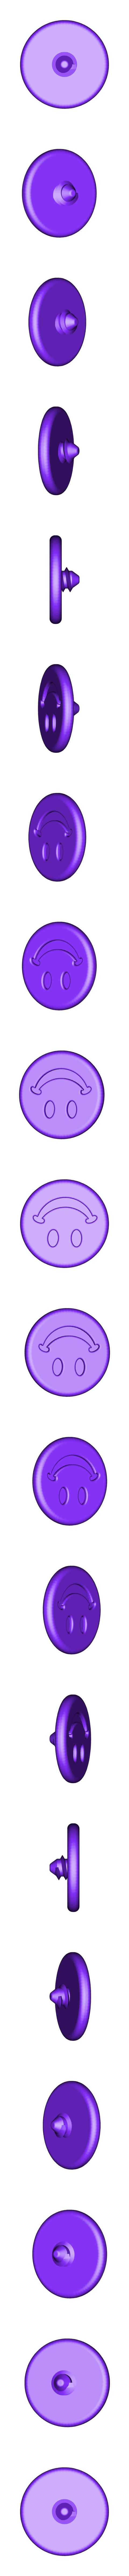 Smiley_Single.STL Download free STL file SMILEY FACE Golf Ball Marker • 3D printing design, Balkhagal4D